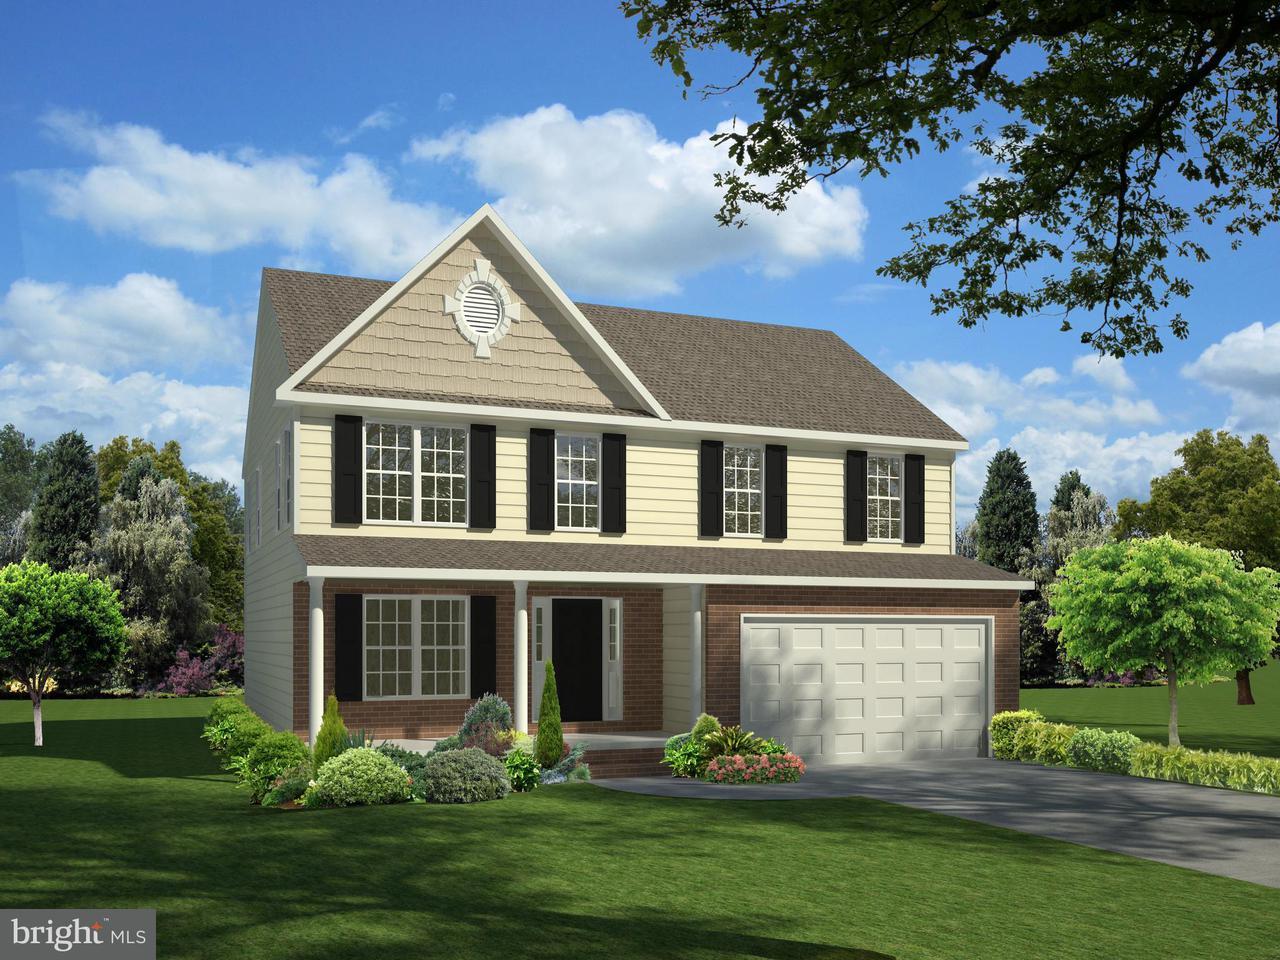 Single Family Home for Sale at 1235 HAMPTON Road 1235 HAMPTON Road Annapolis, Maryland 21409 United States